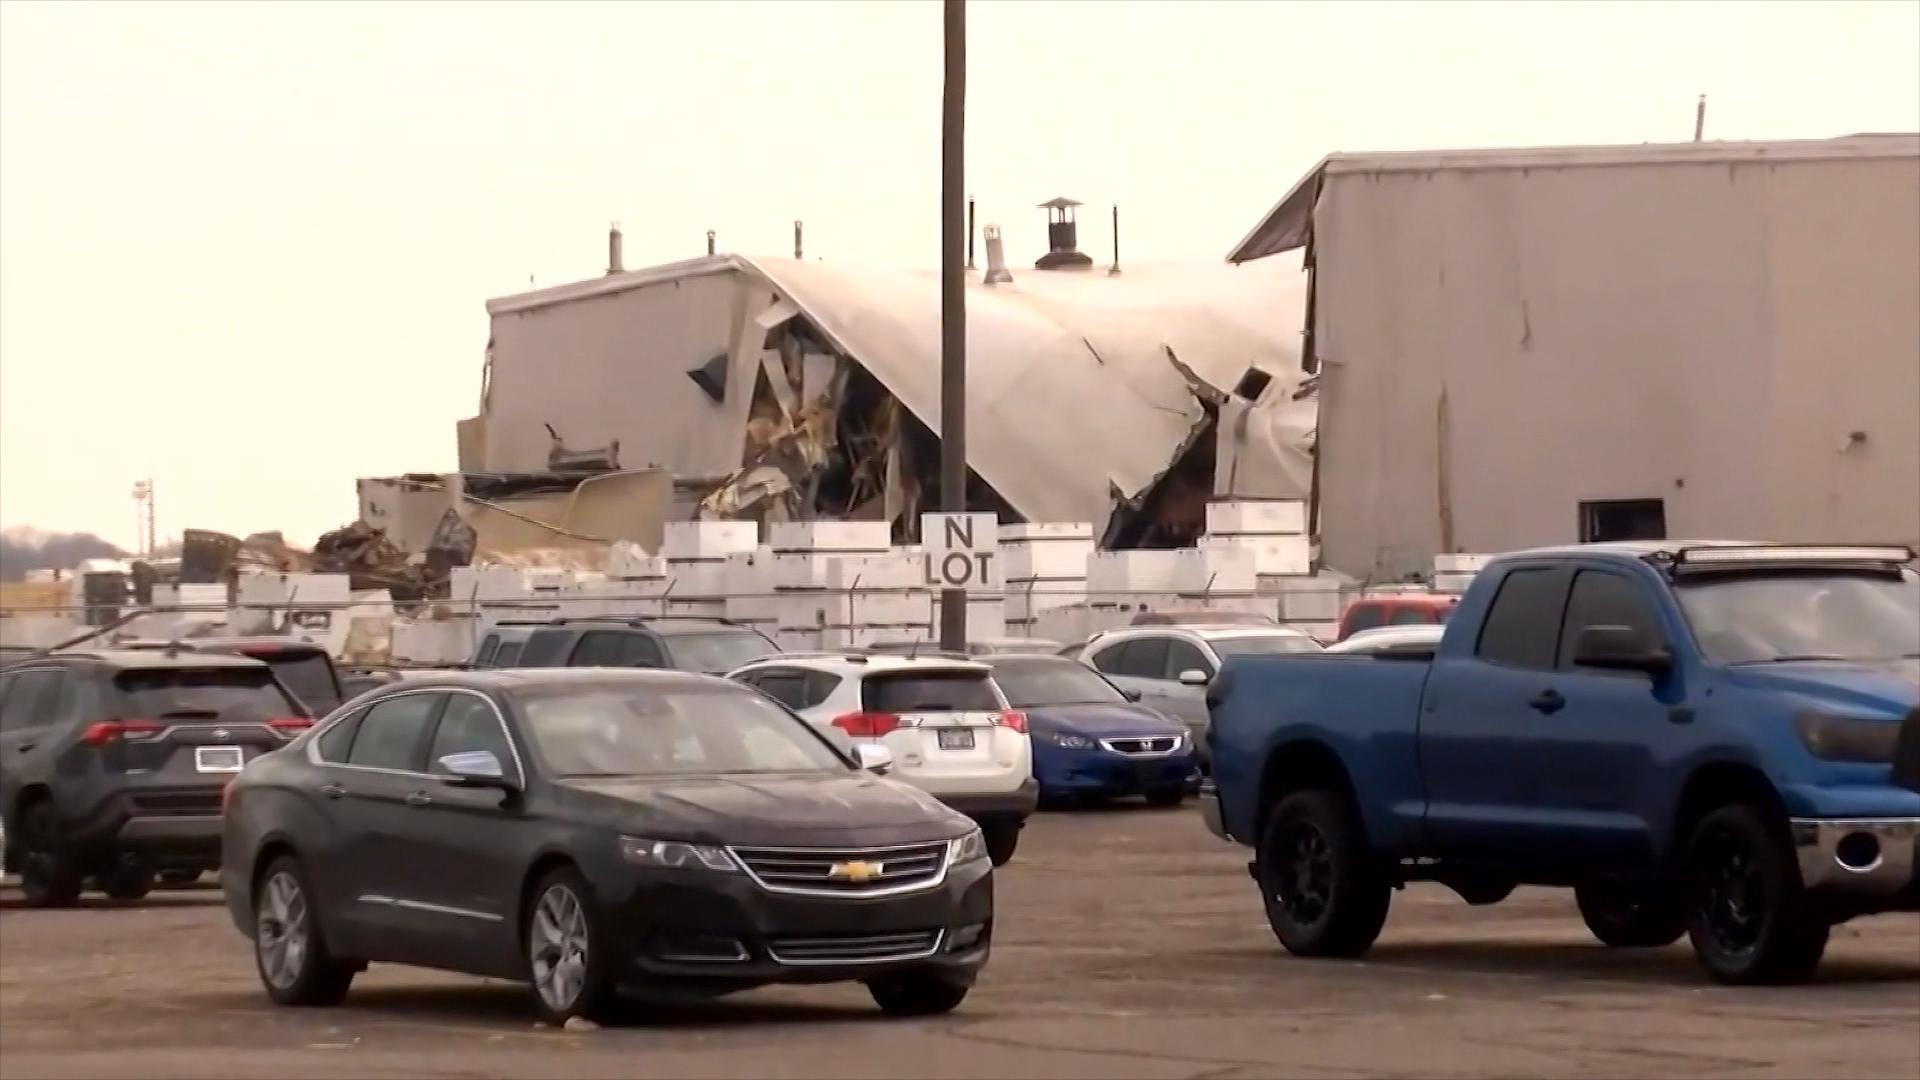 Beechcraft manufacturing plant explodes in Wichita, Kansas, injuring 15